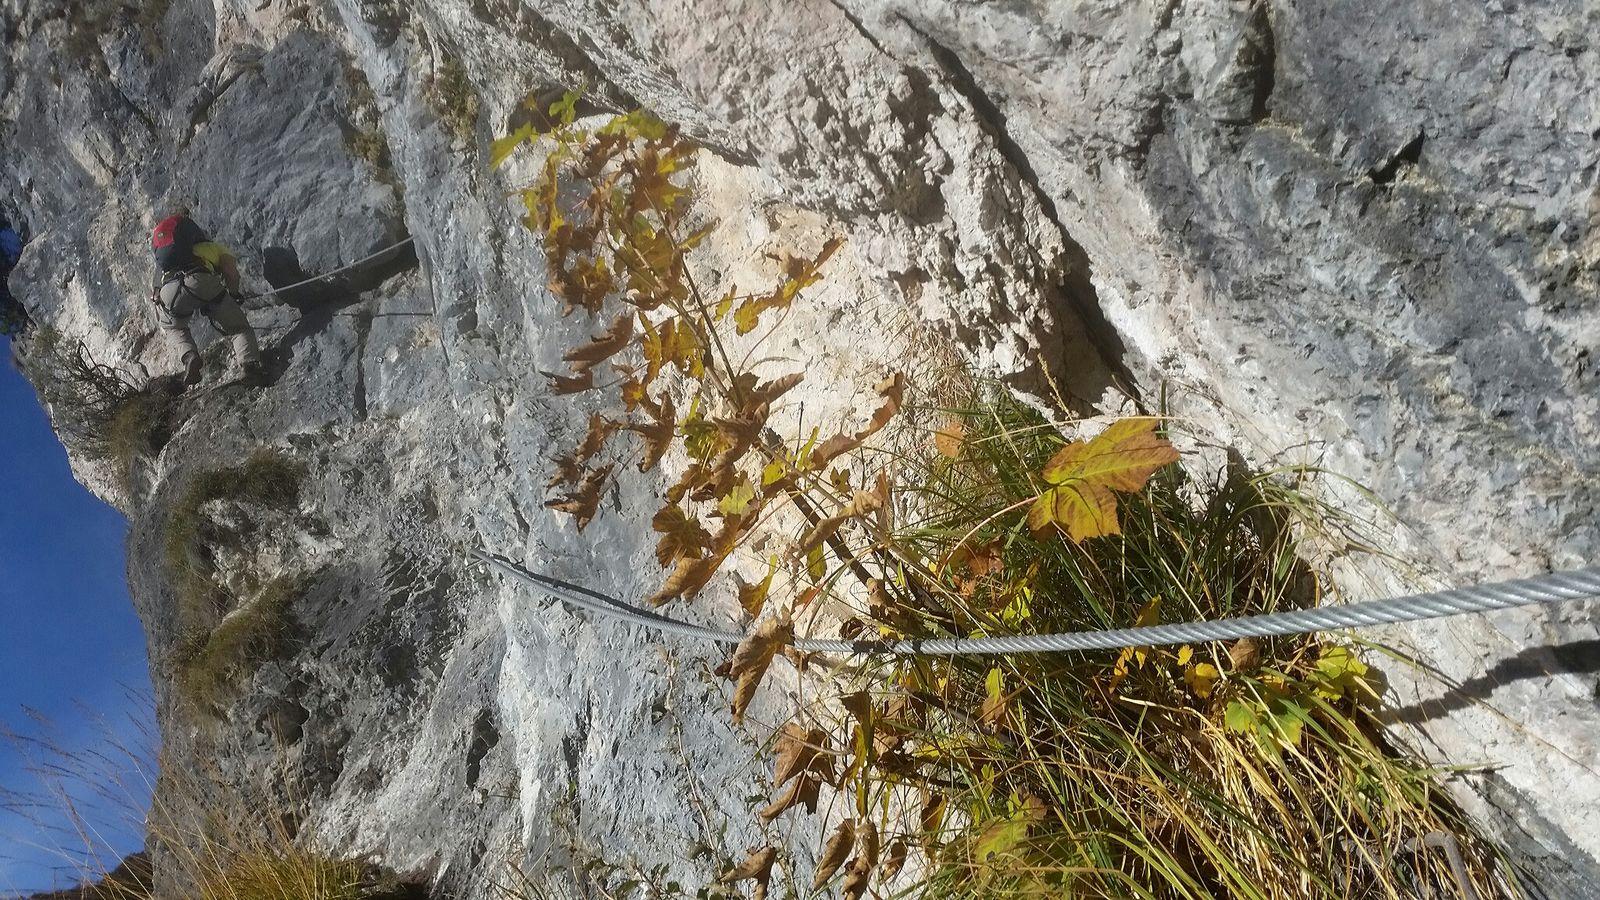 Klettersteig Grünstein : Klettersteig grünstein am königssee isidor variante tour